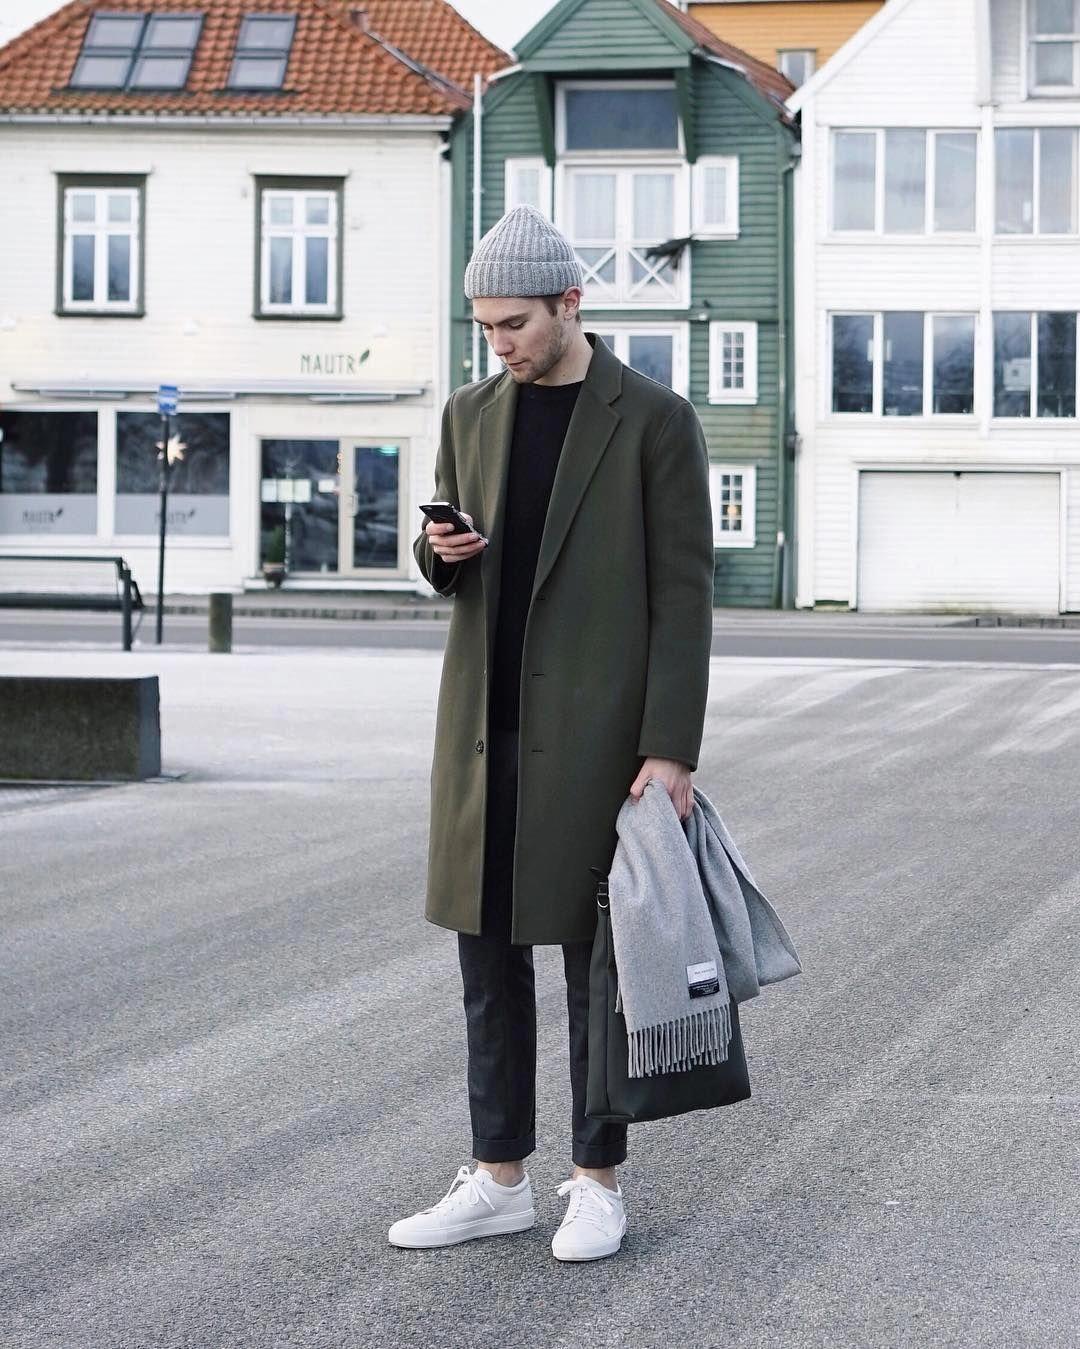 Topcoat Casual Menswear Mens Style Fashion Green Olive Scandinavian Norway Sneakers Win Winter Outfits Men Casual Winter Outfits Mens Winter Fashion